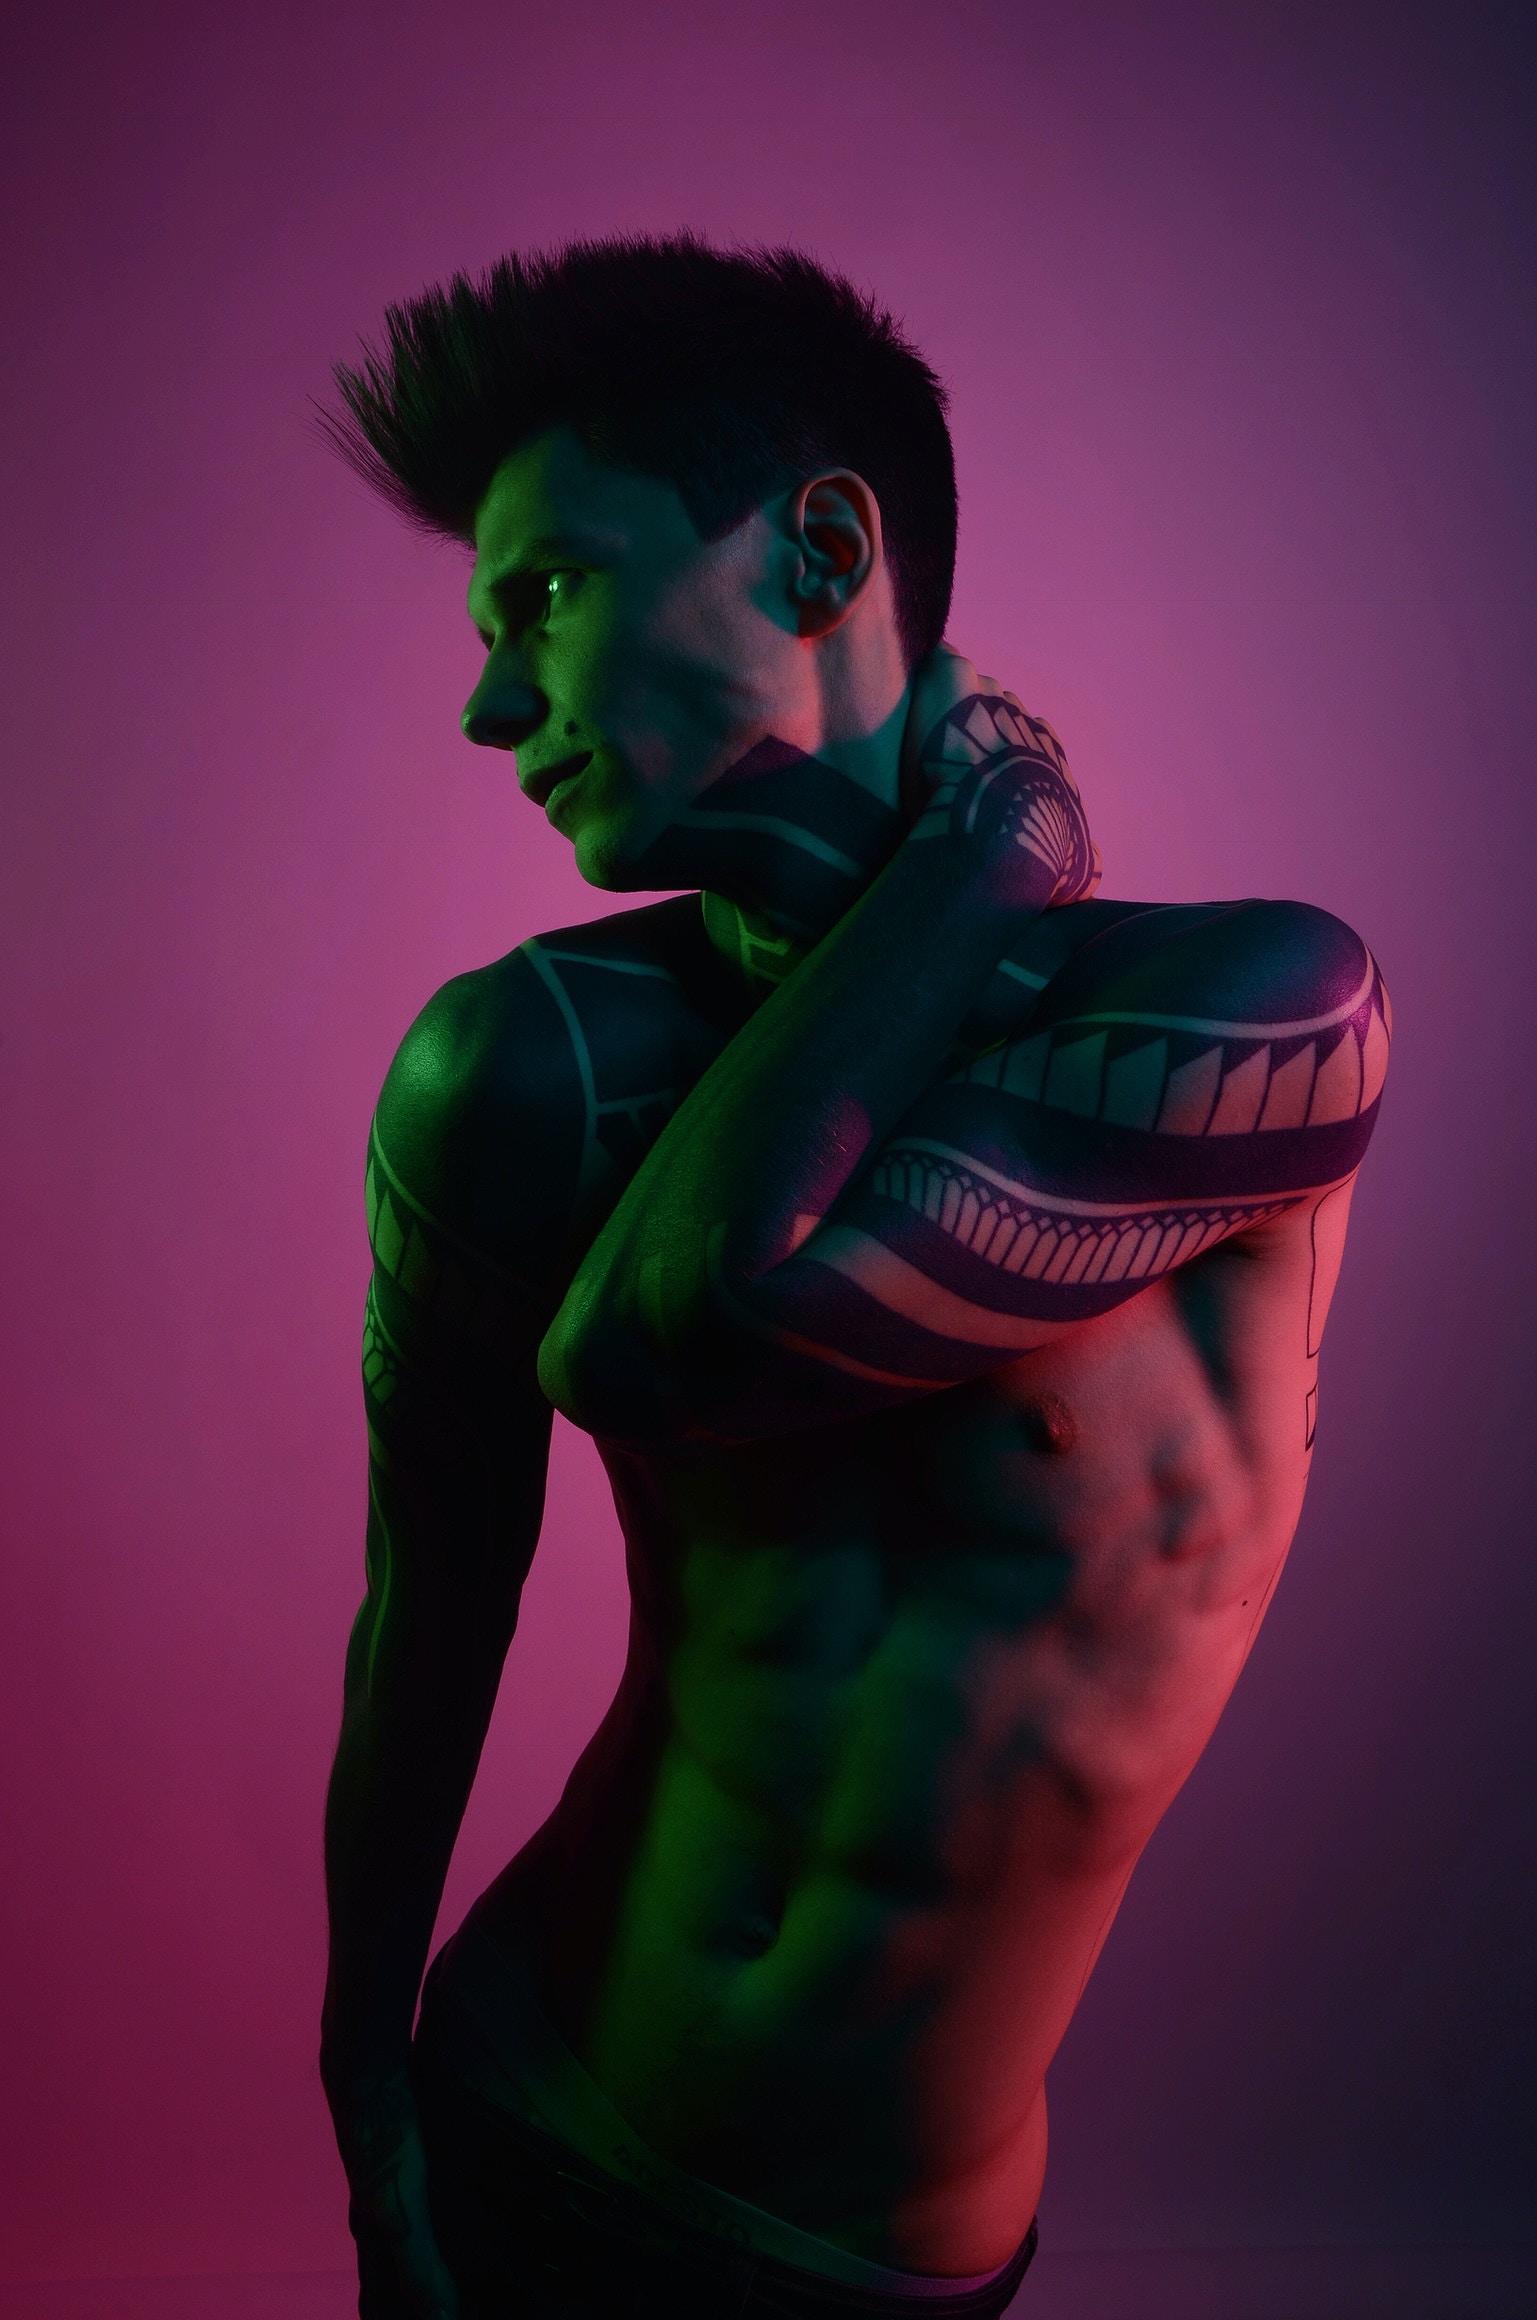 man with black tattoos